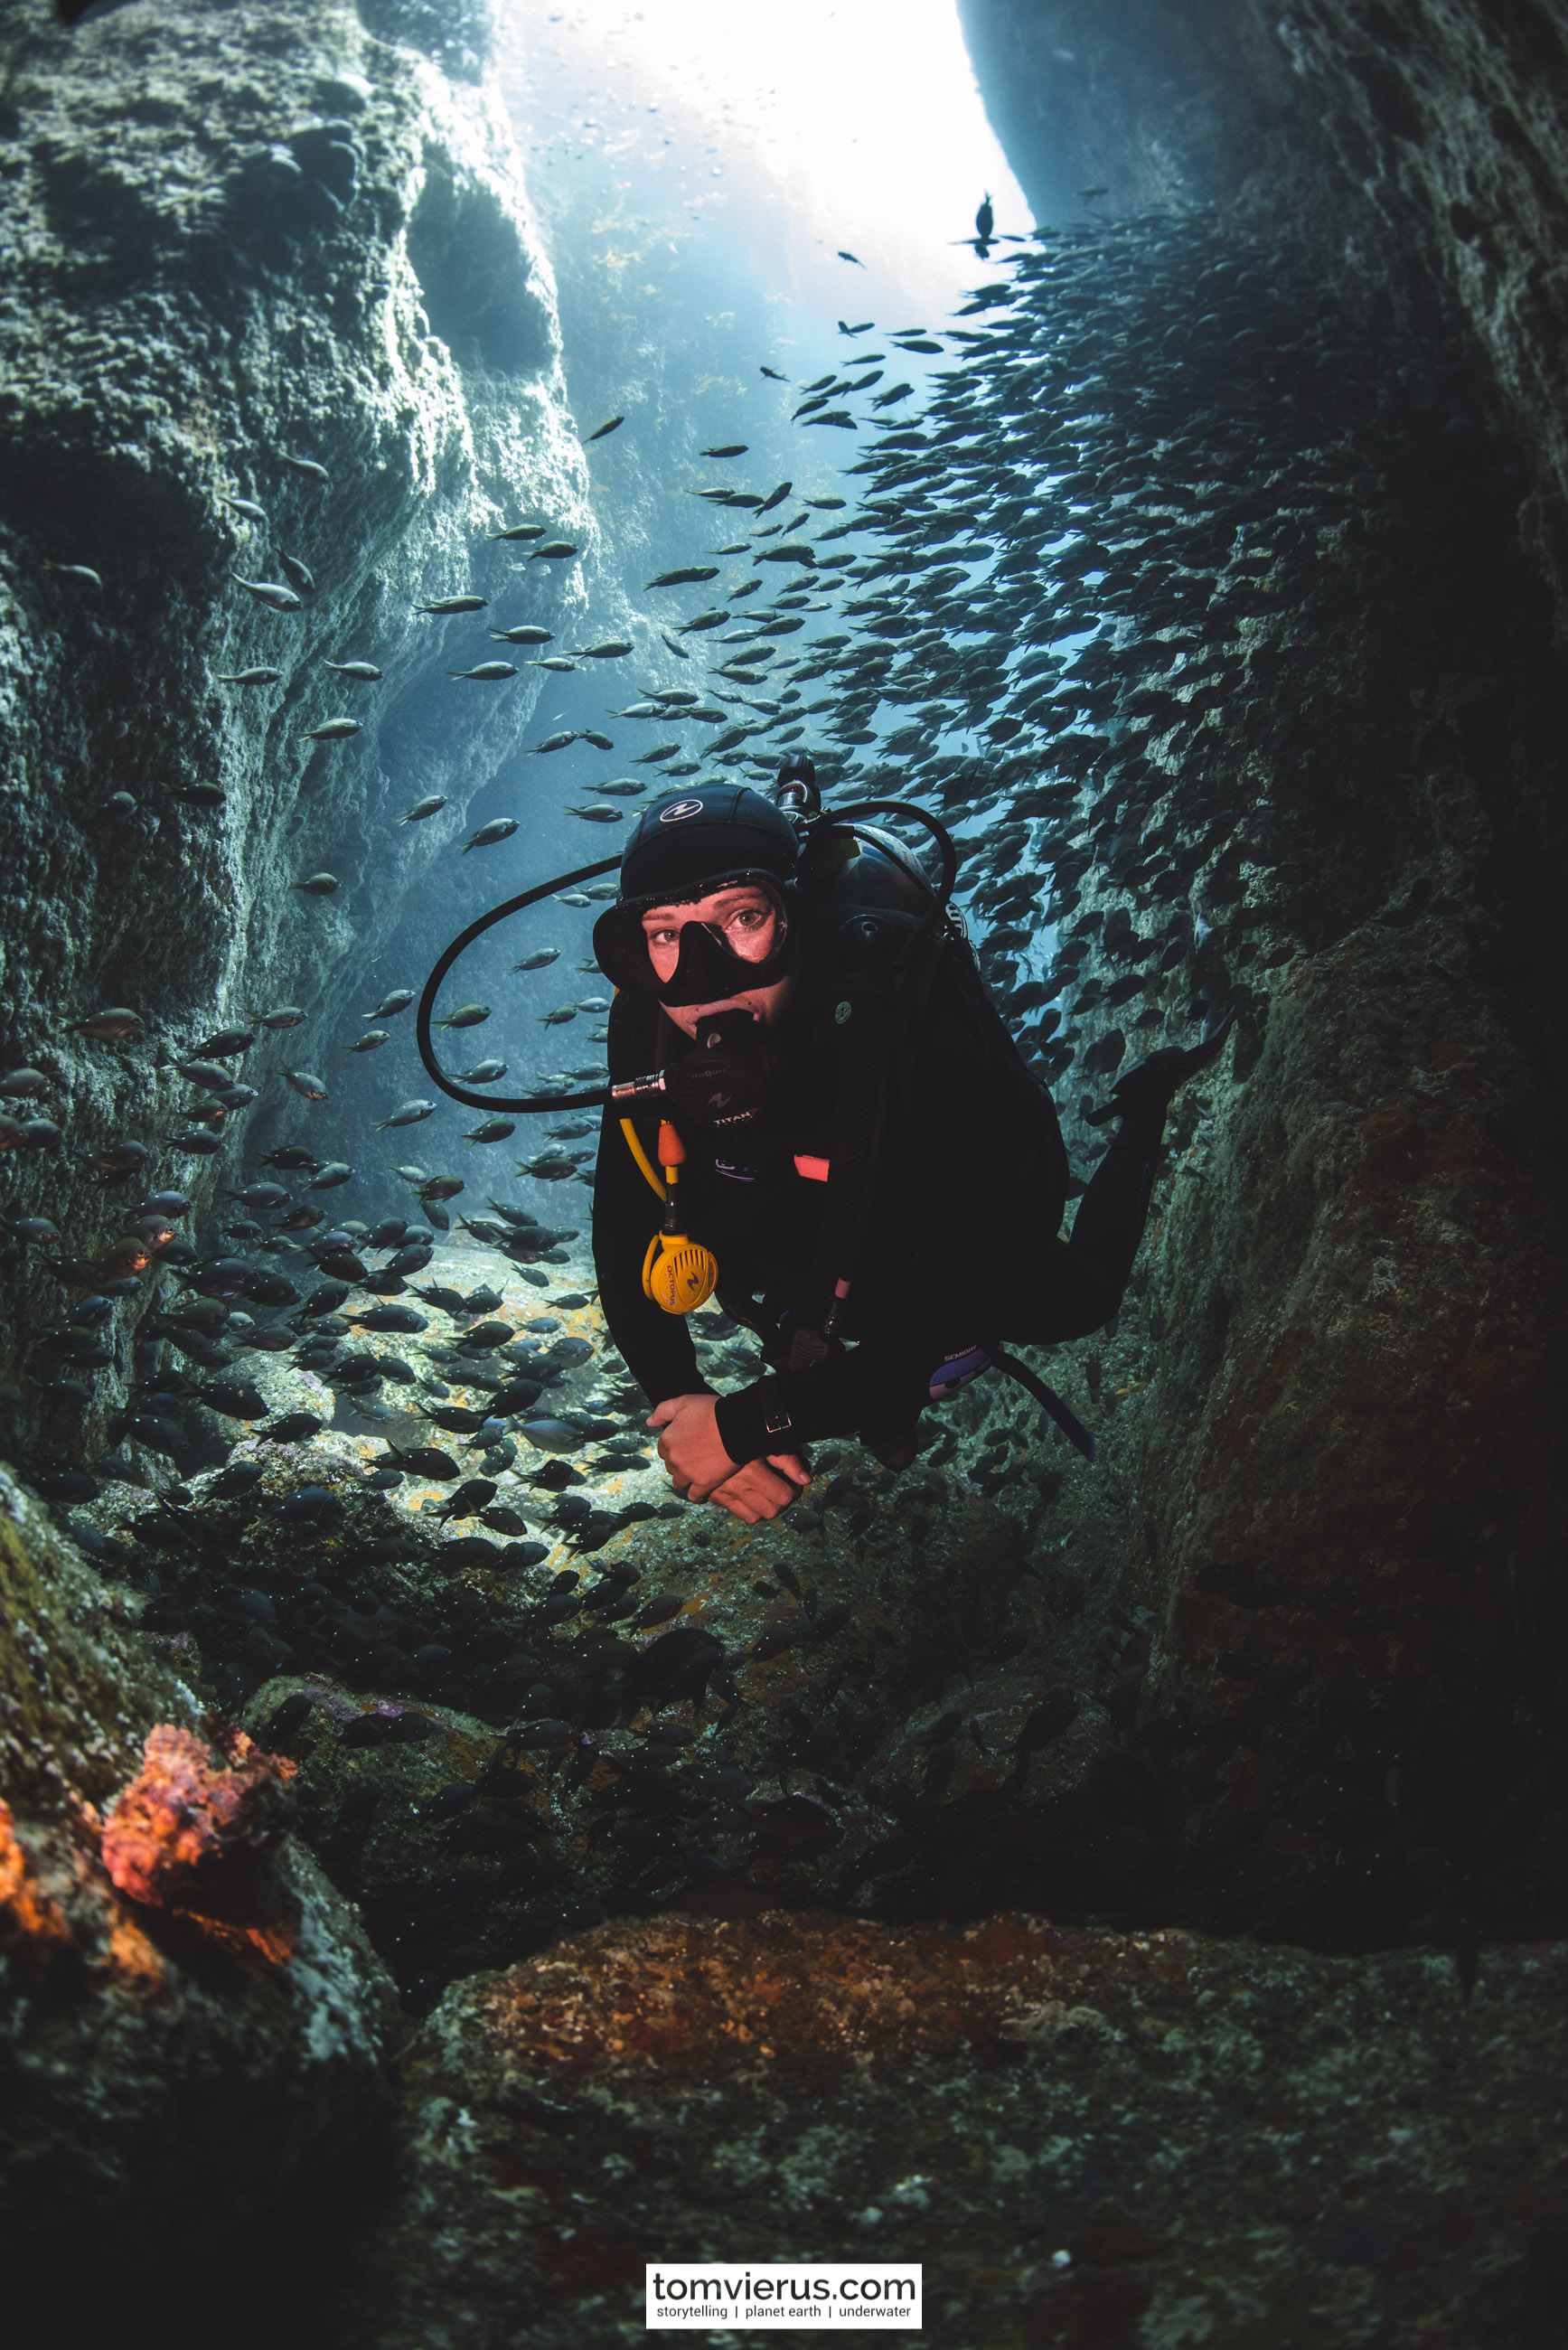 Poor Knights Islands, Diving, Underwater, Nikon, Photography, fish